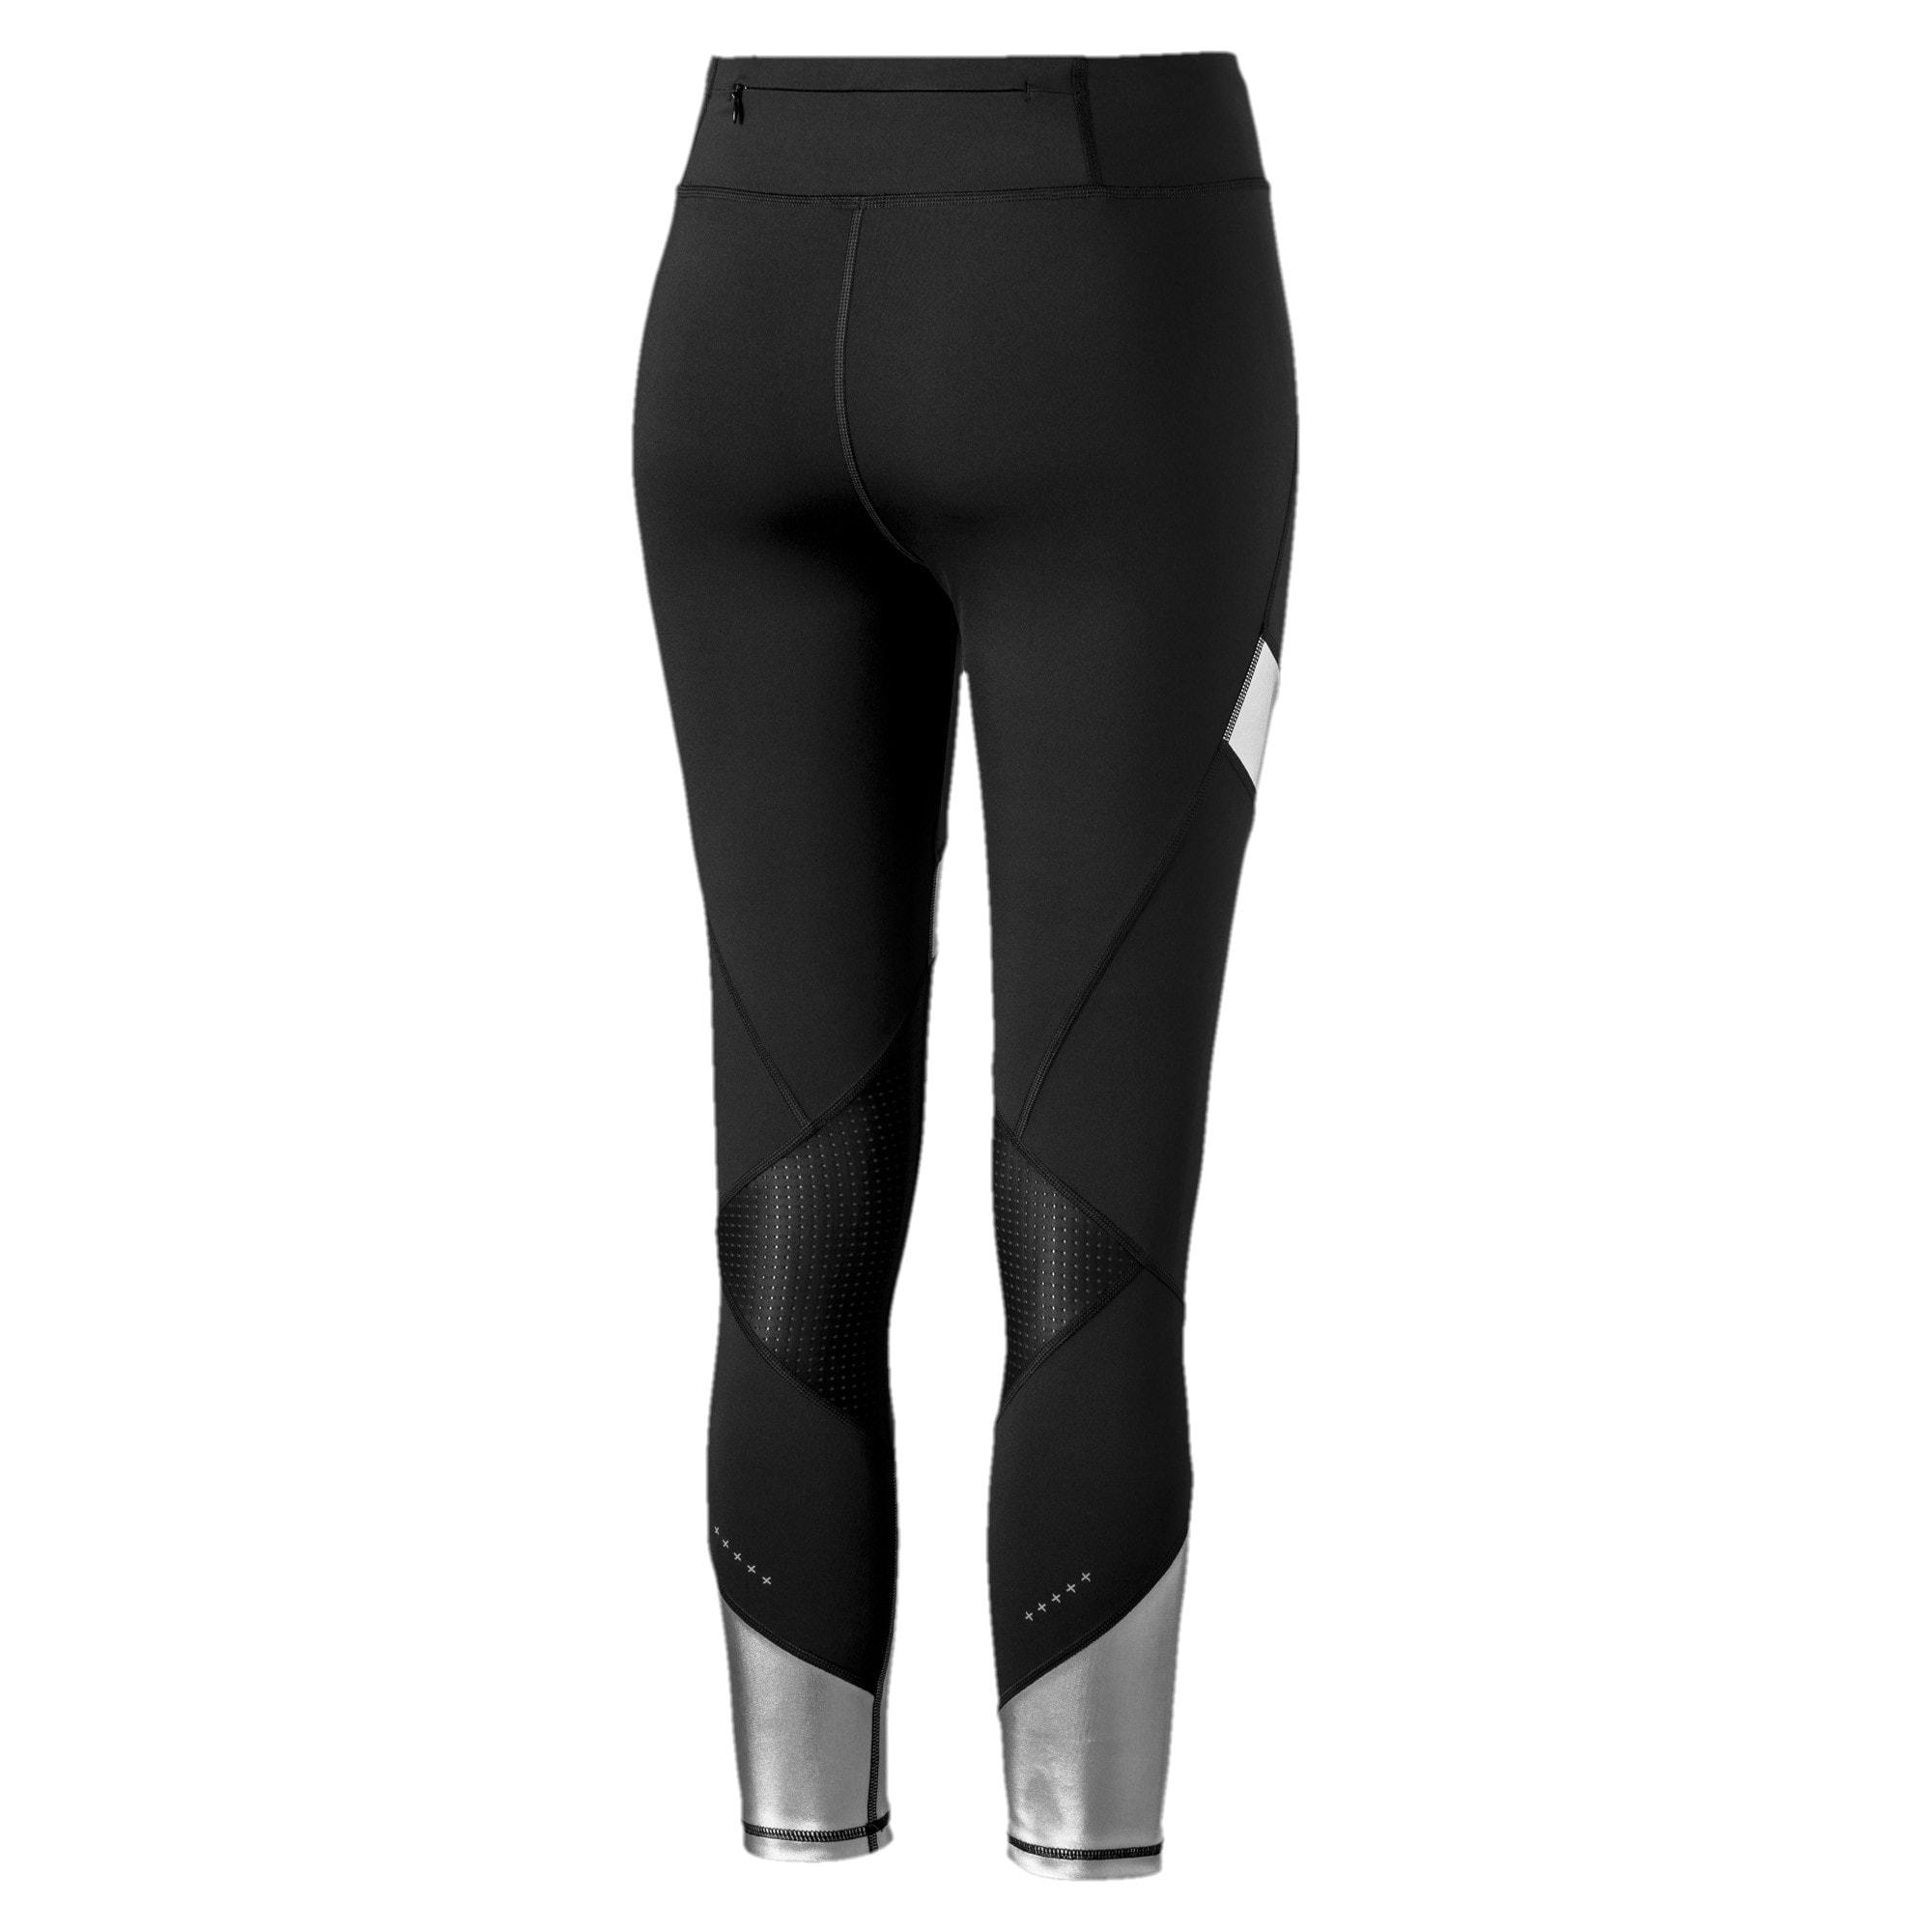 Thumbnail 6 of Elite Speed Women's Leggings, Puma Black-Silver, medium